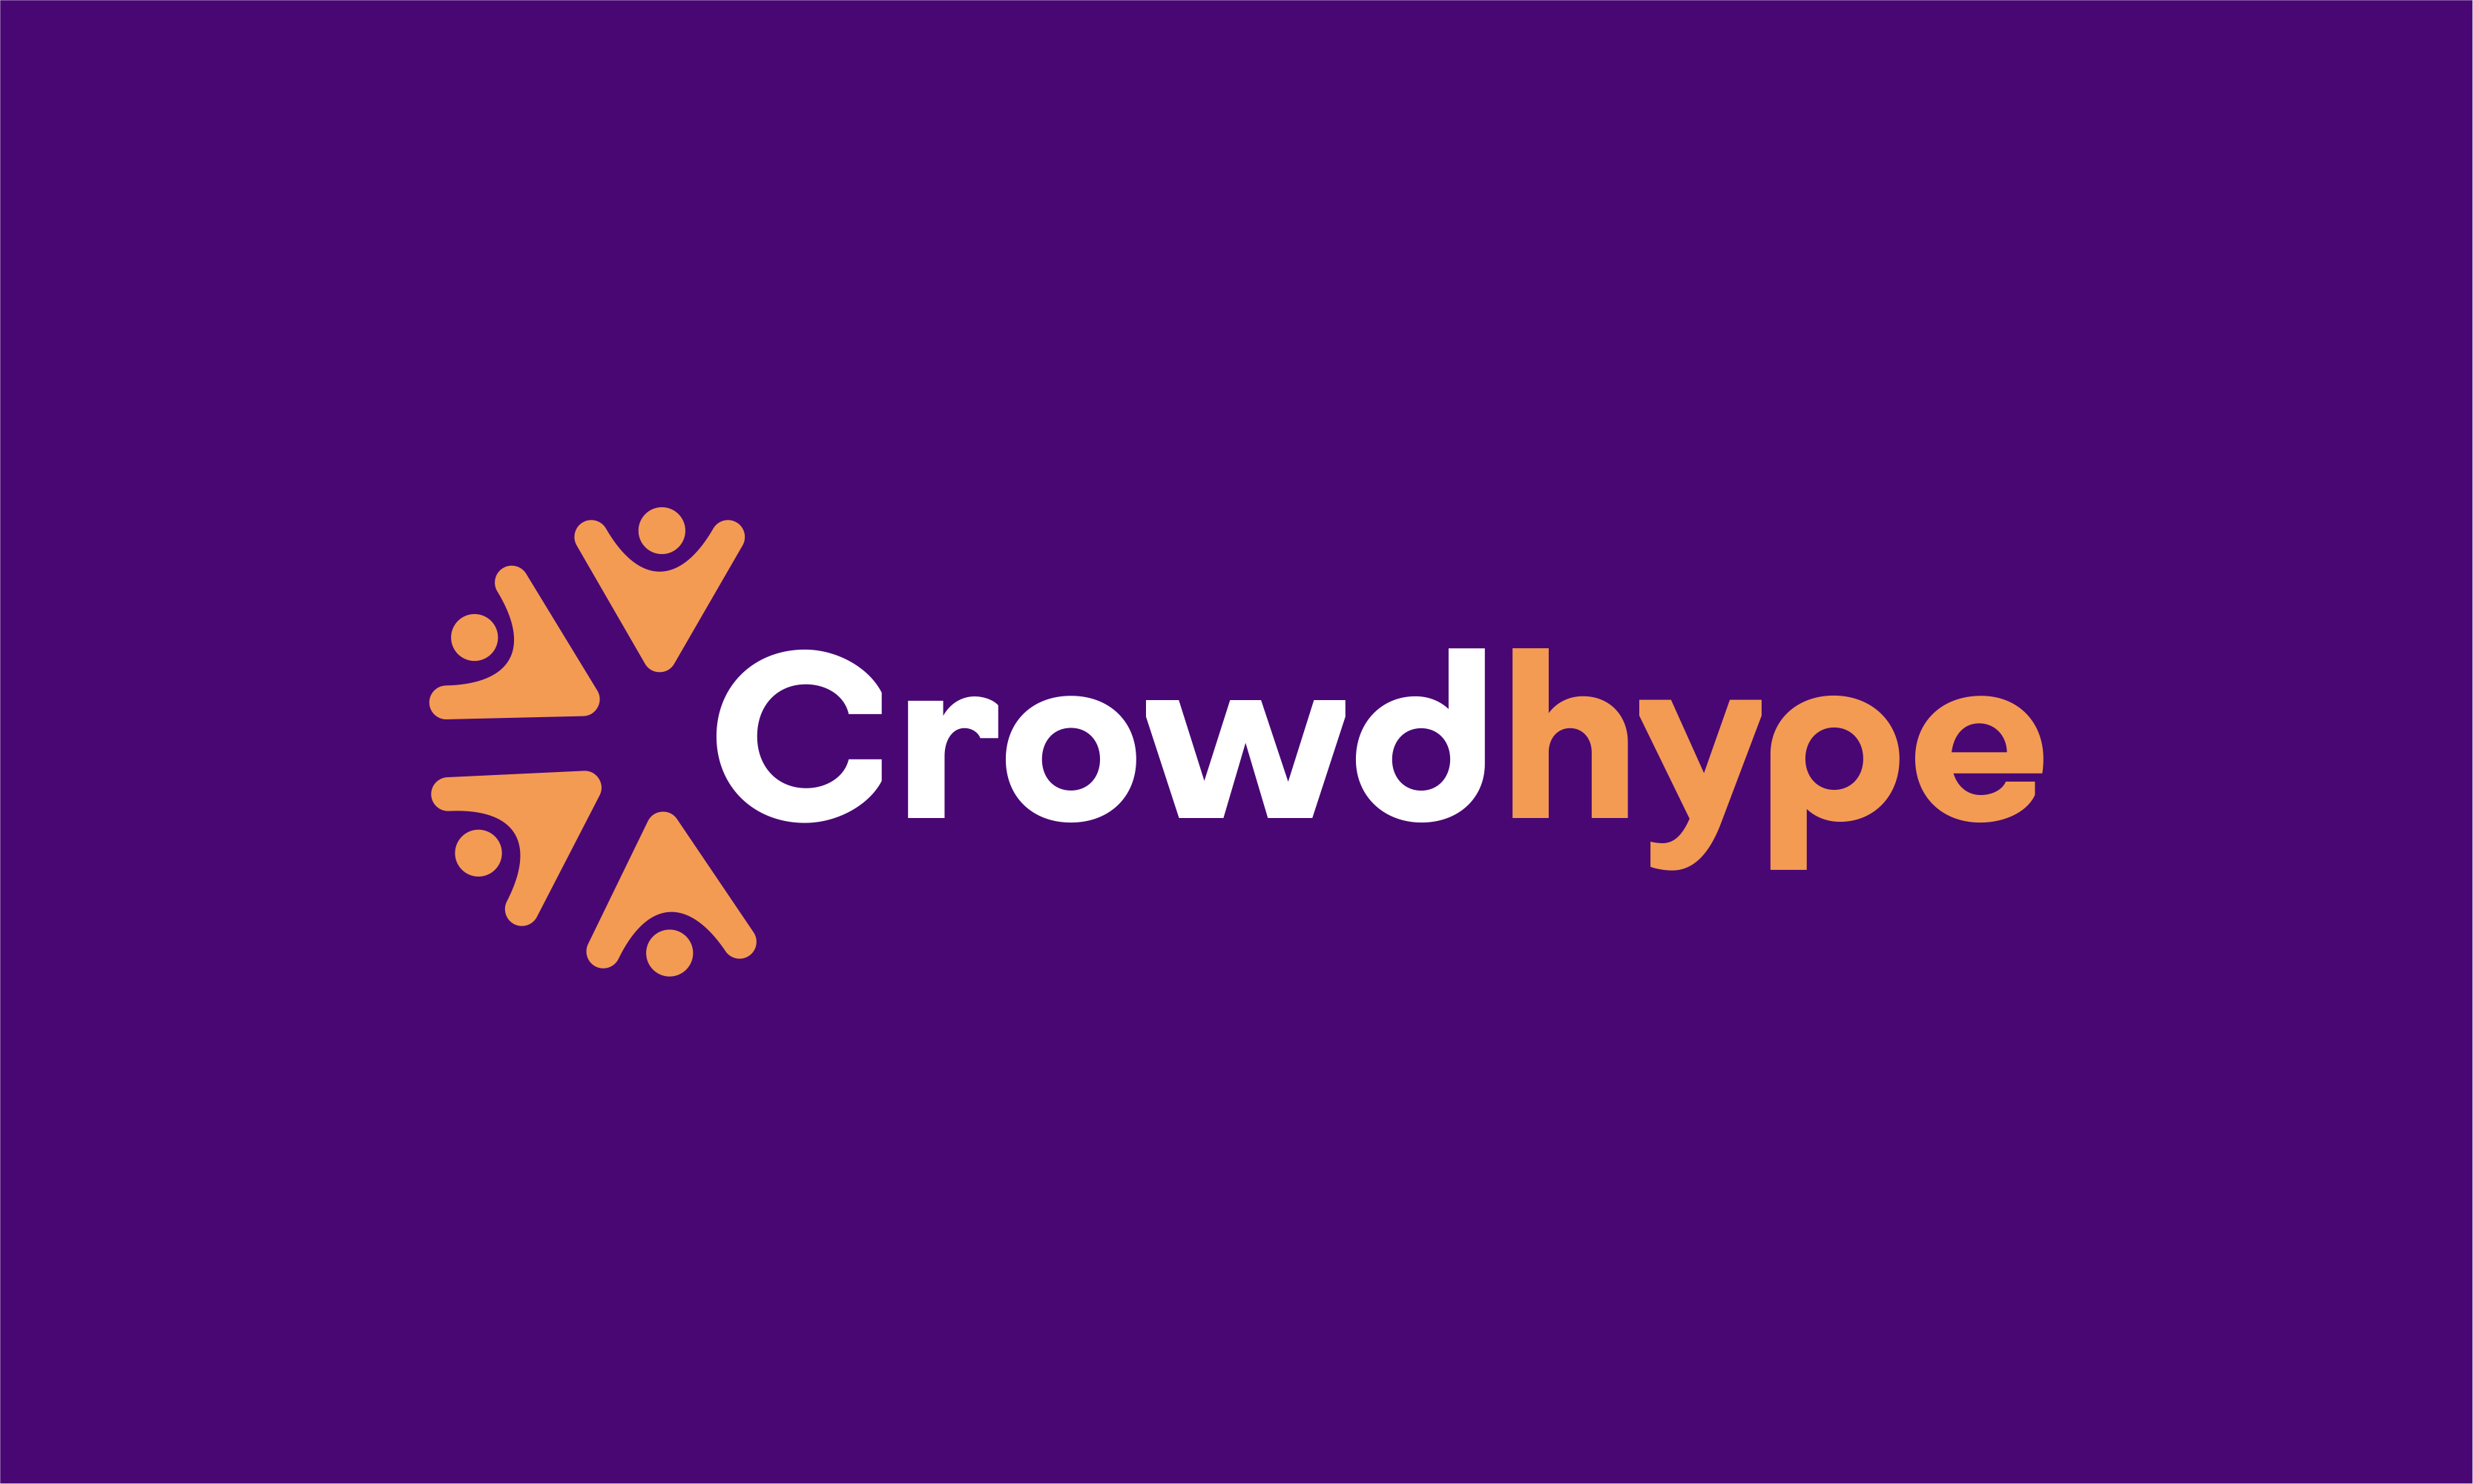 Crowdhype